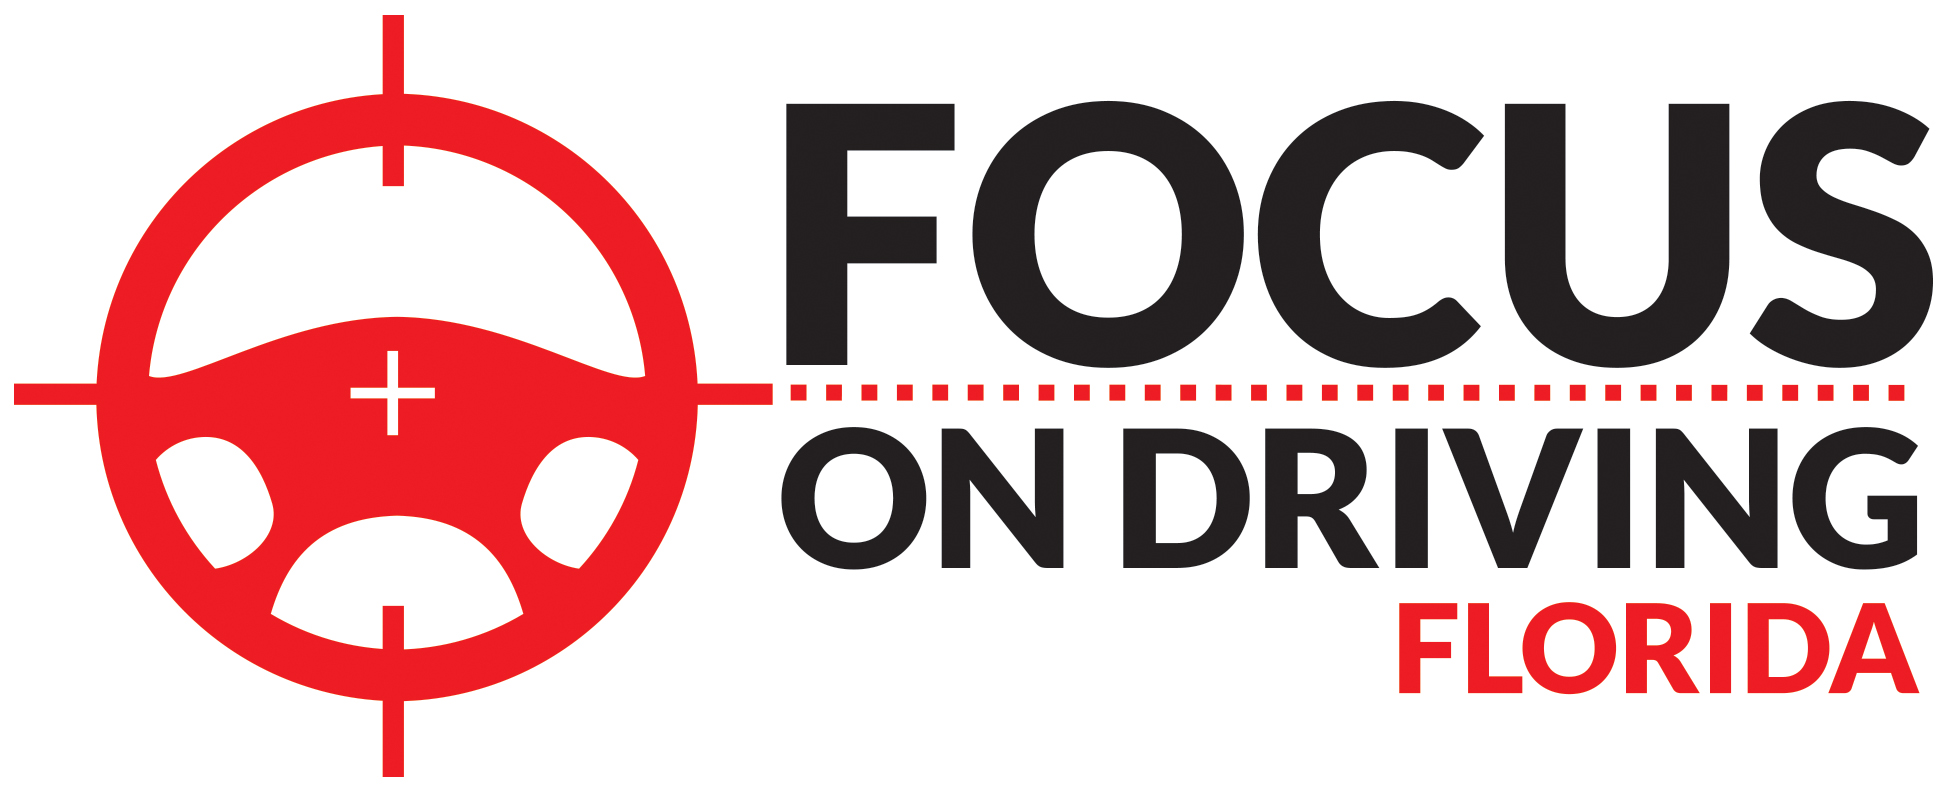 Florida Distracted Driving Awareness Month April 2016